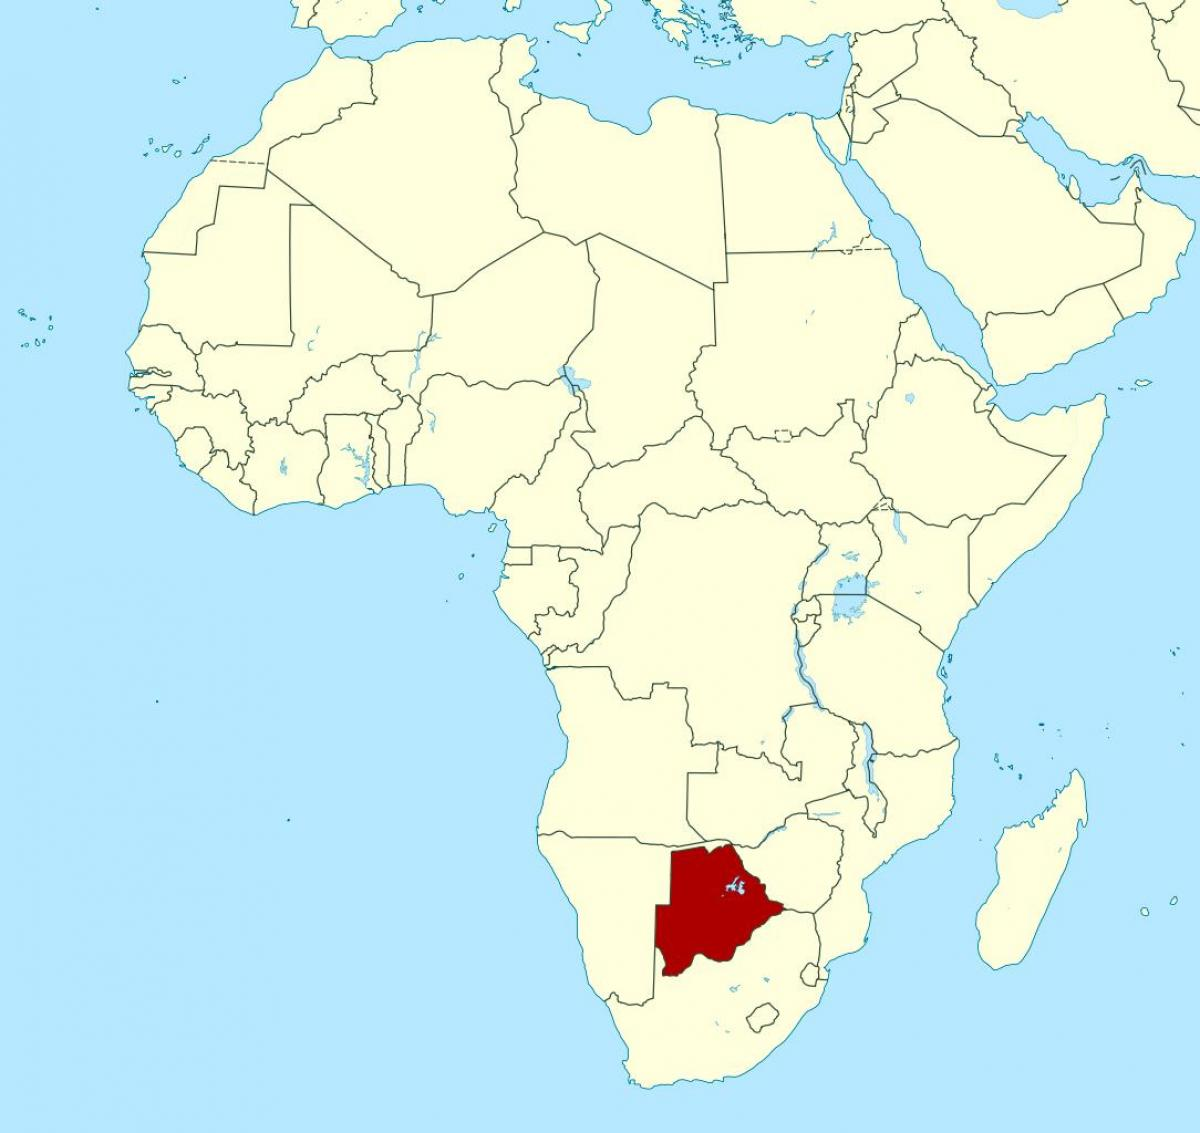 Botswana A World Map Terkep Botswana A Vilag Del Afrika Afrika